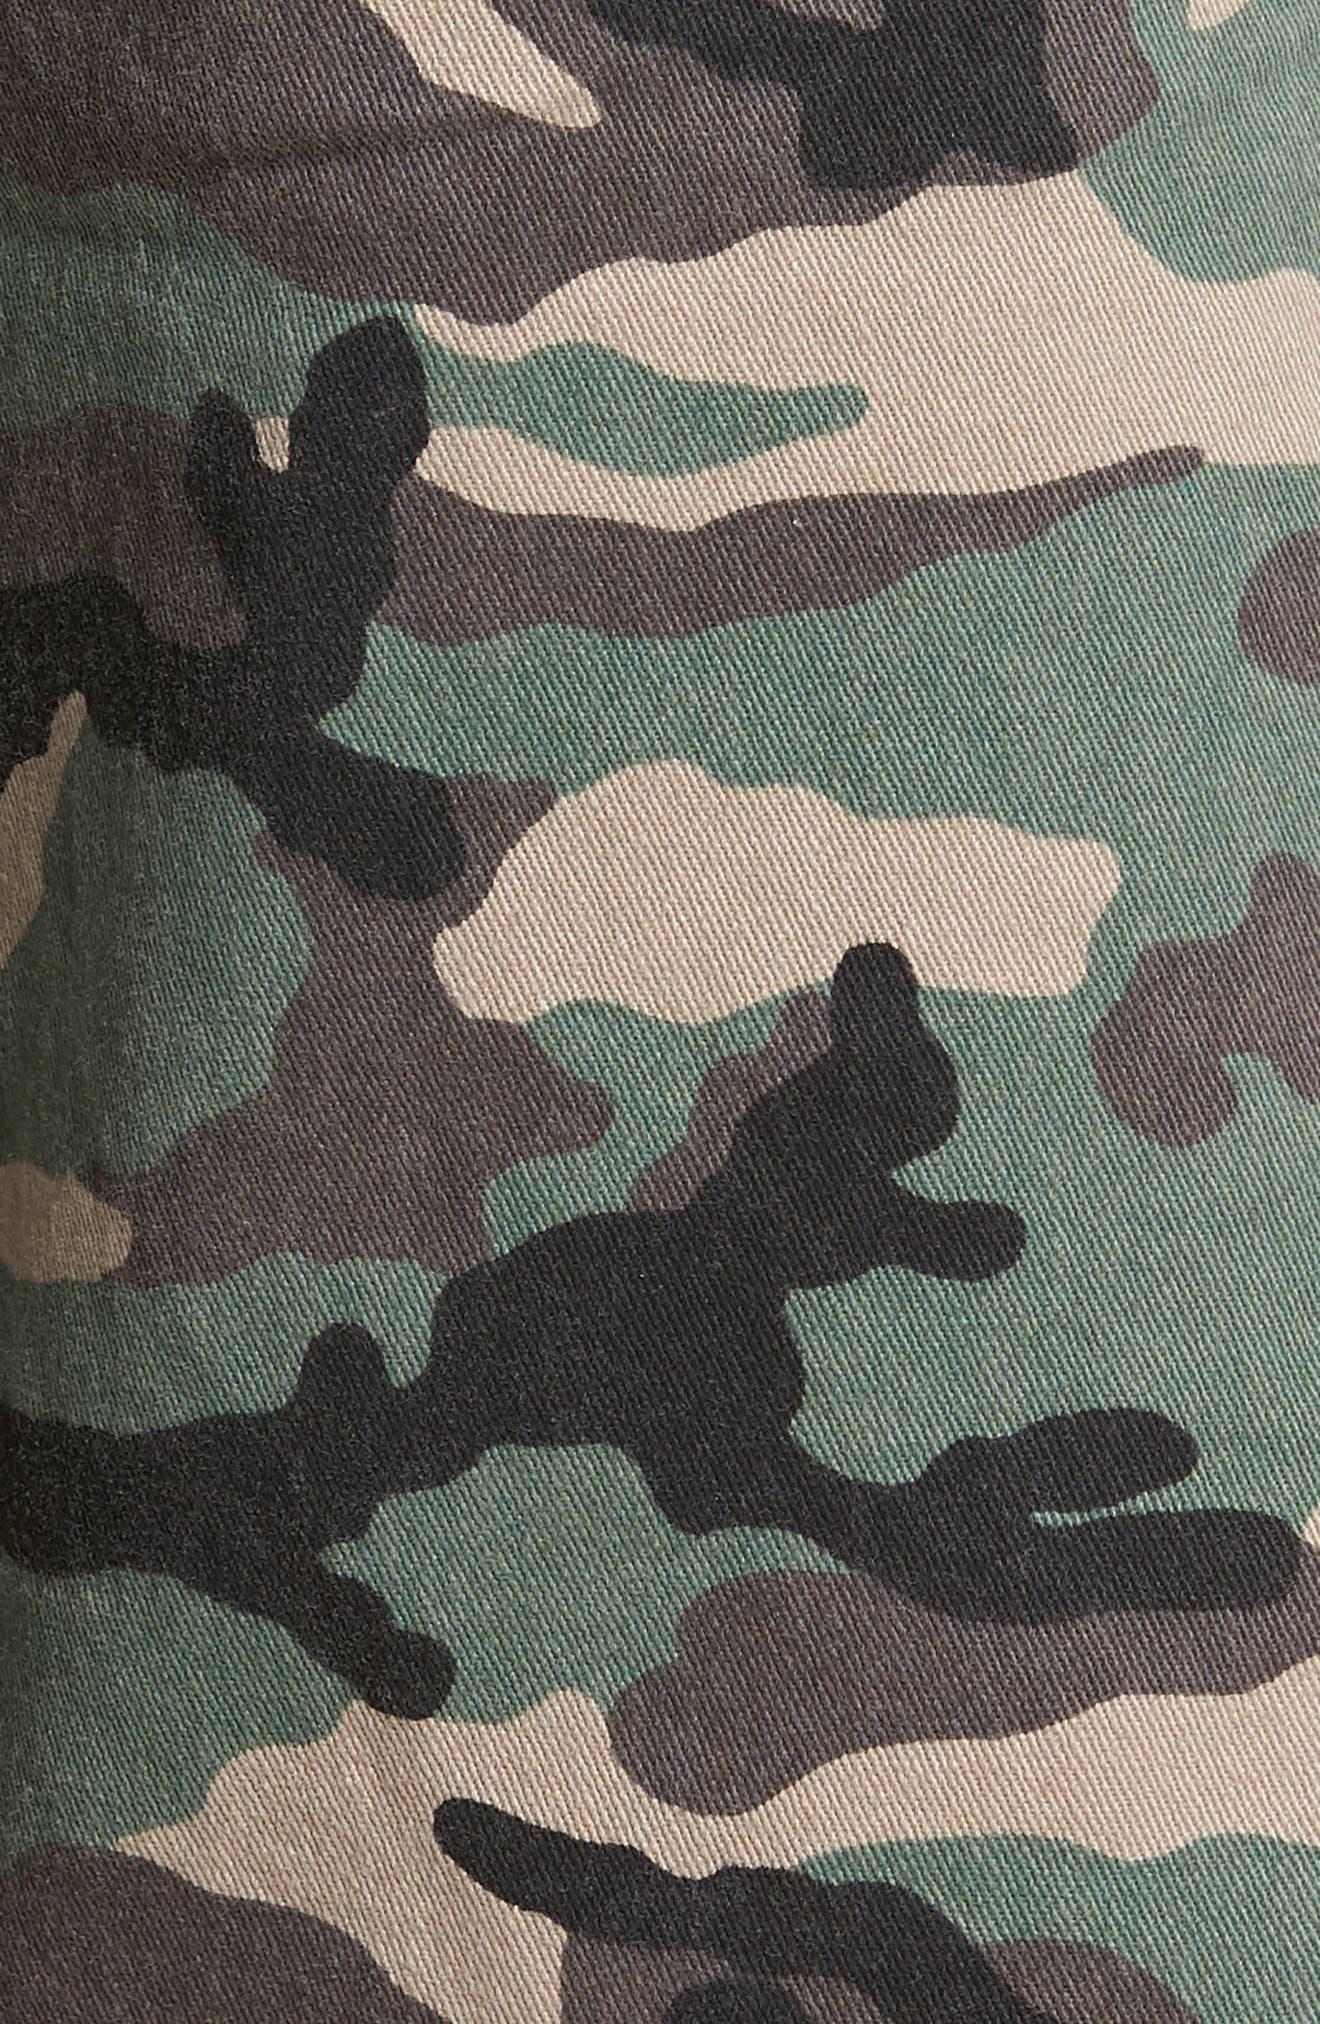 Camo Print Cutoff Twill Shorts,                             Alternate thumbnail 5, color,                             Brown Green Camo